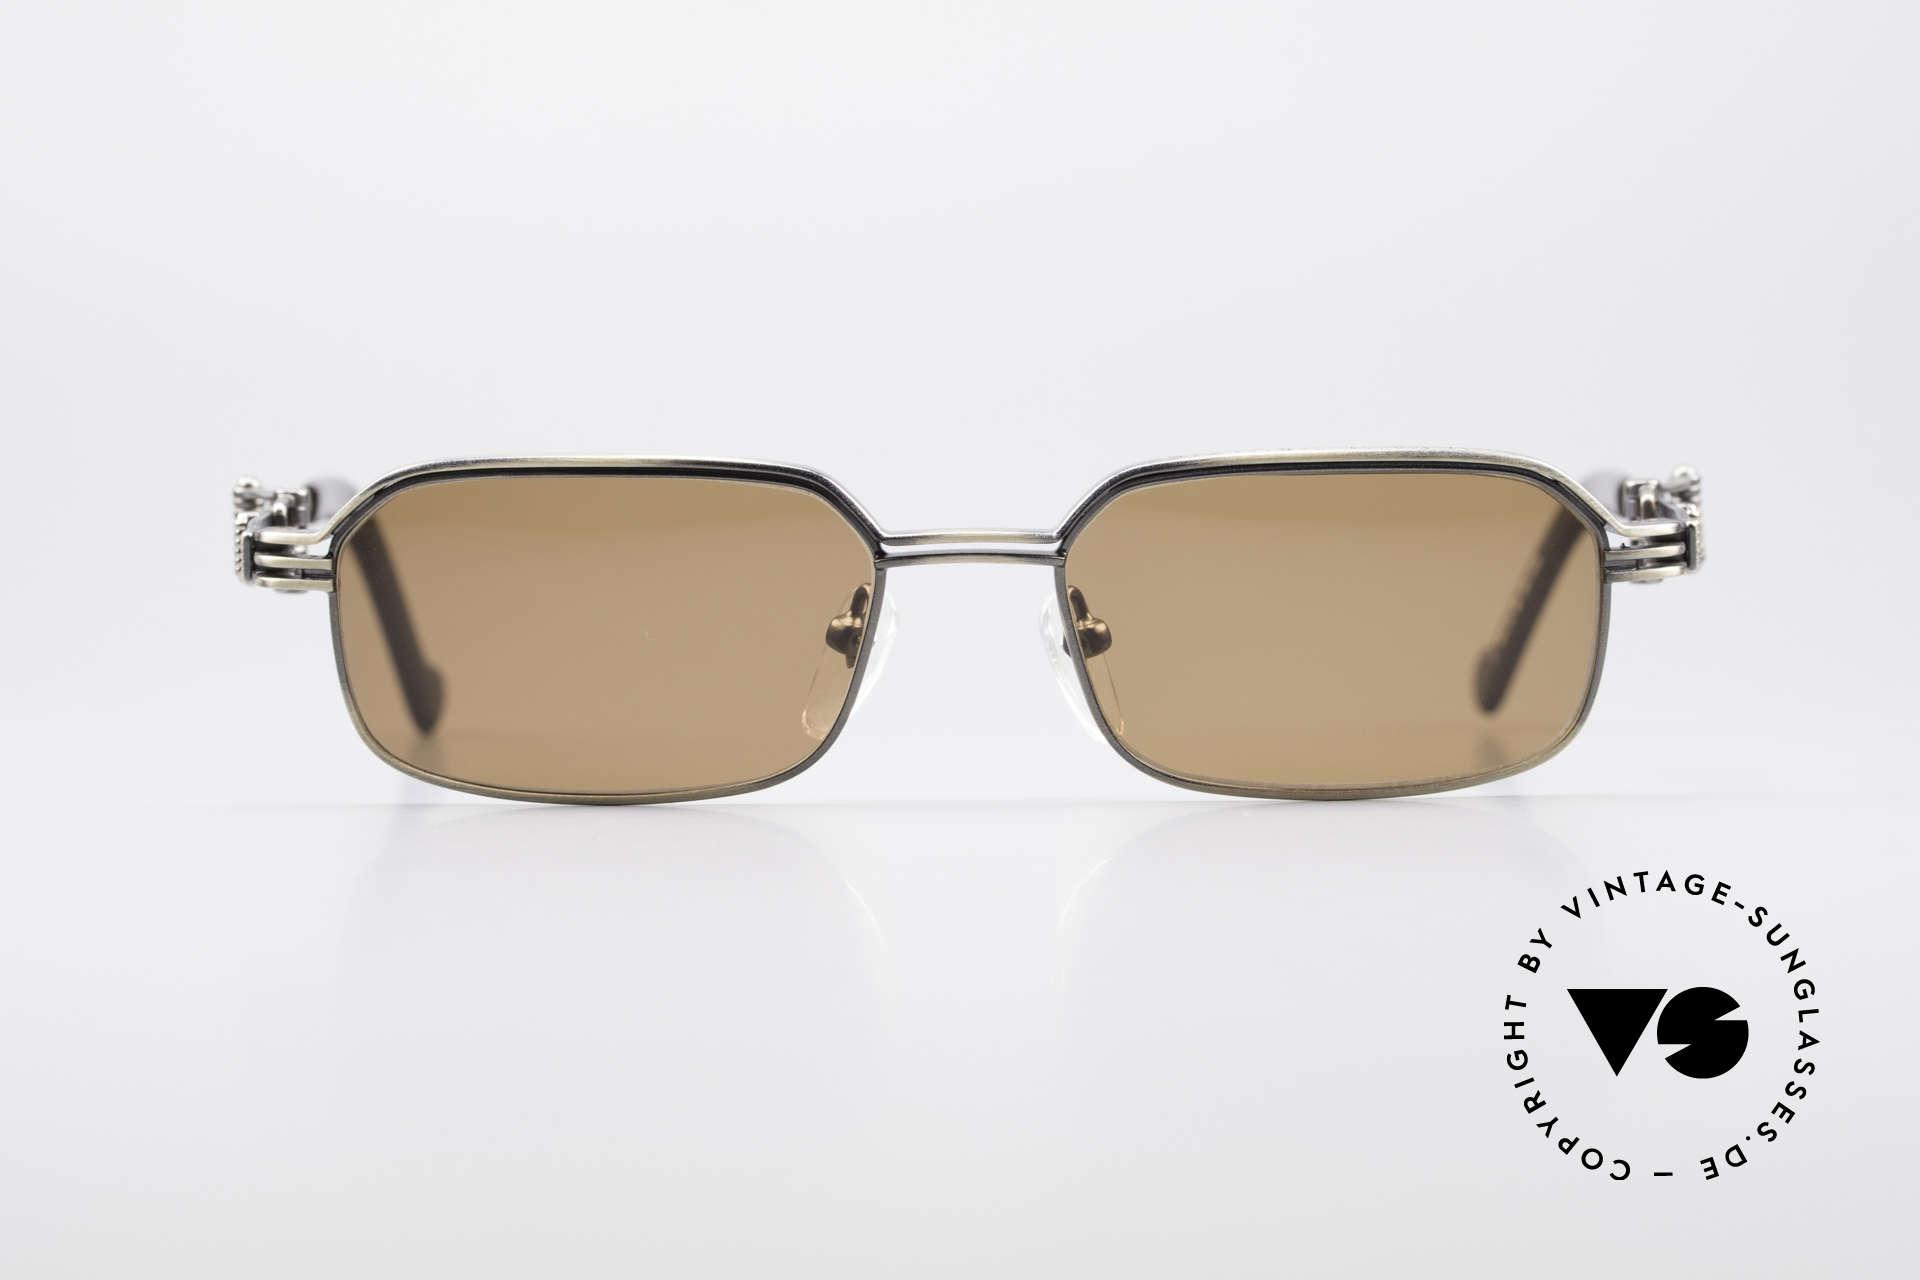 Jean Paul Gaultier 56-0002 Adjustable Frame Belt Buckle, outstanding TOP-quality (antique titanium frame), Made for Men